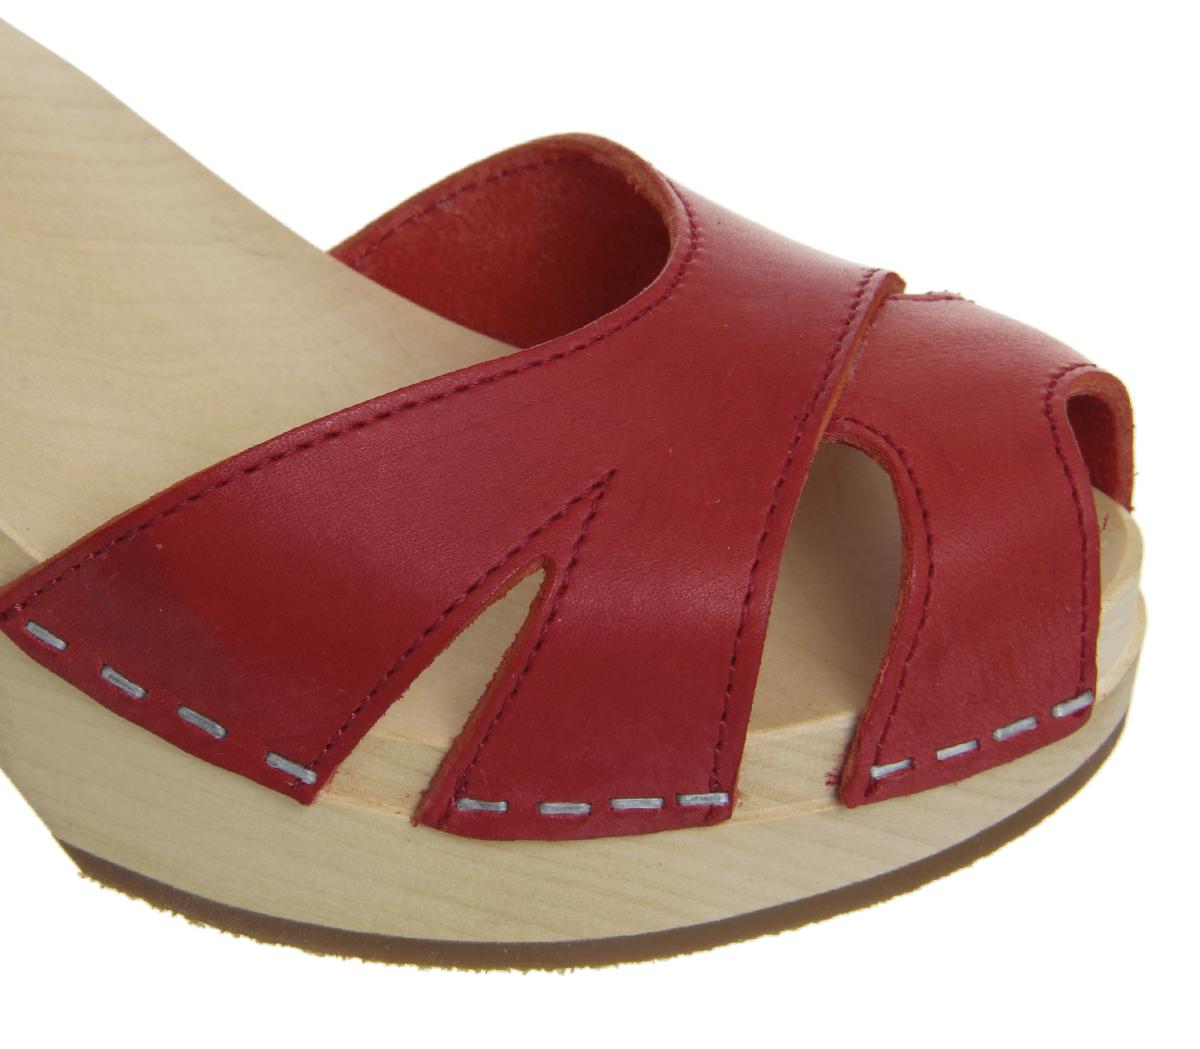 82580c650dd443 Sentinel Womens Swedish Hasbeens Suzanne Hi Peep Toe Sandals Red Sandals